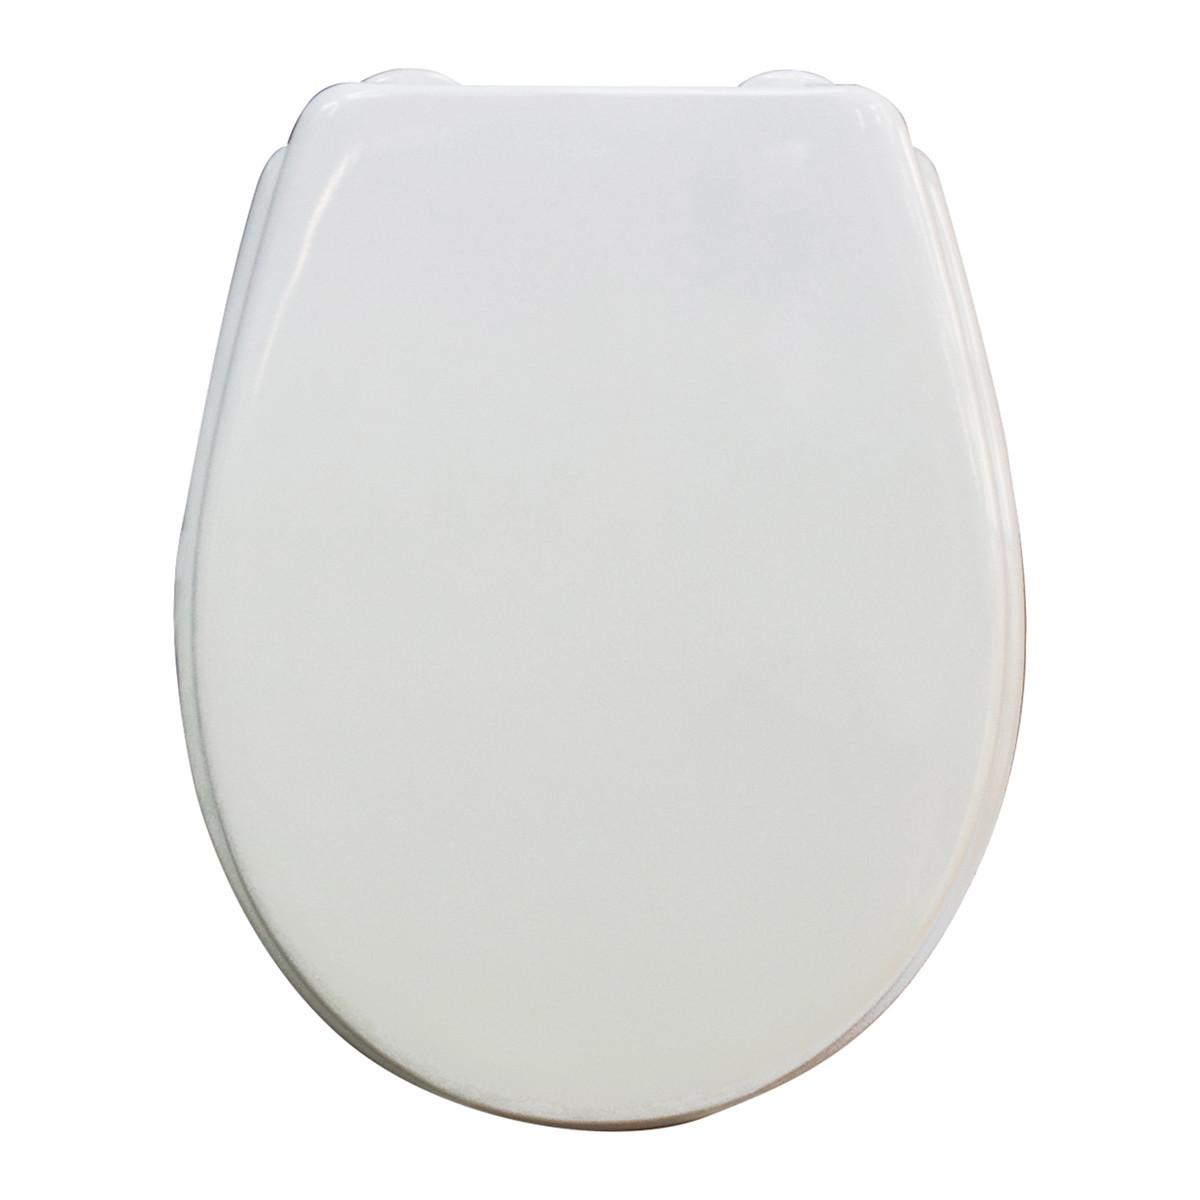 Copriwater colibr 2 bianco prezzi e offerte online for Leroy merlin copriwater